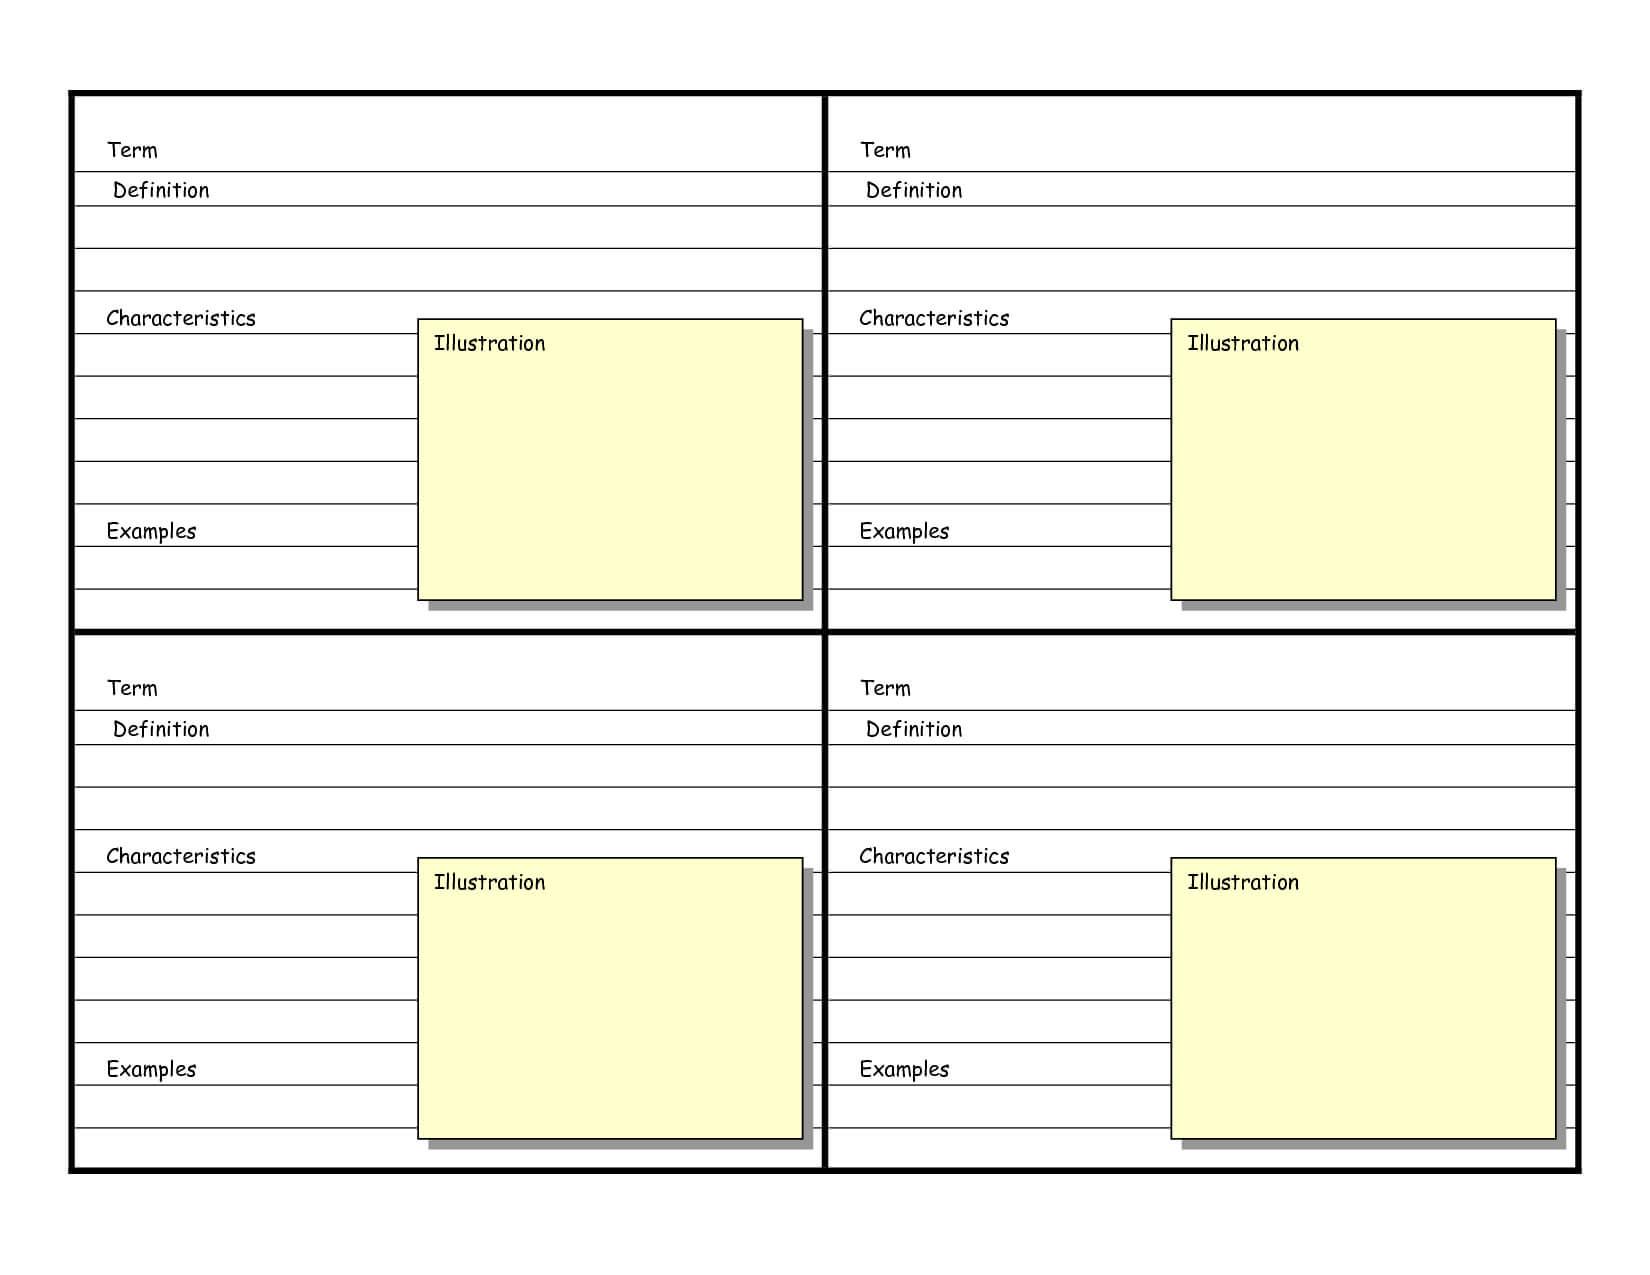 Blank Vocabulary Card Template | Vocabulary Flash Cards regarding Free Printable Flash Cards Template